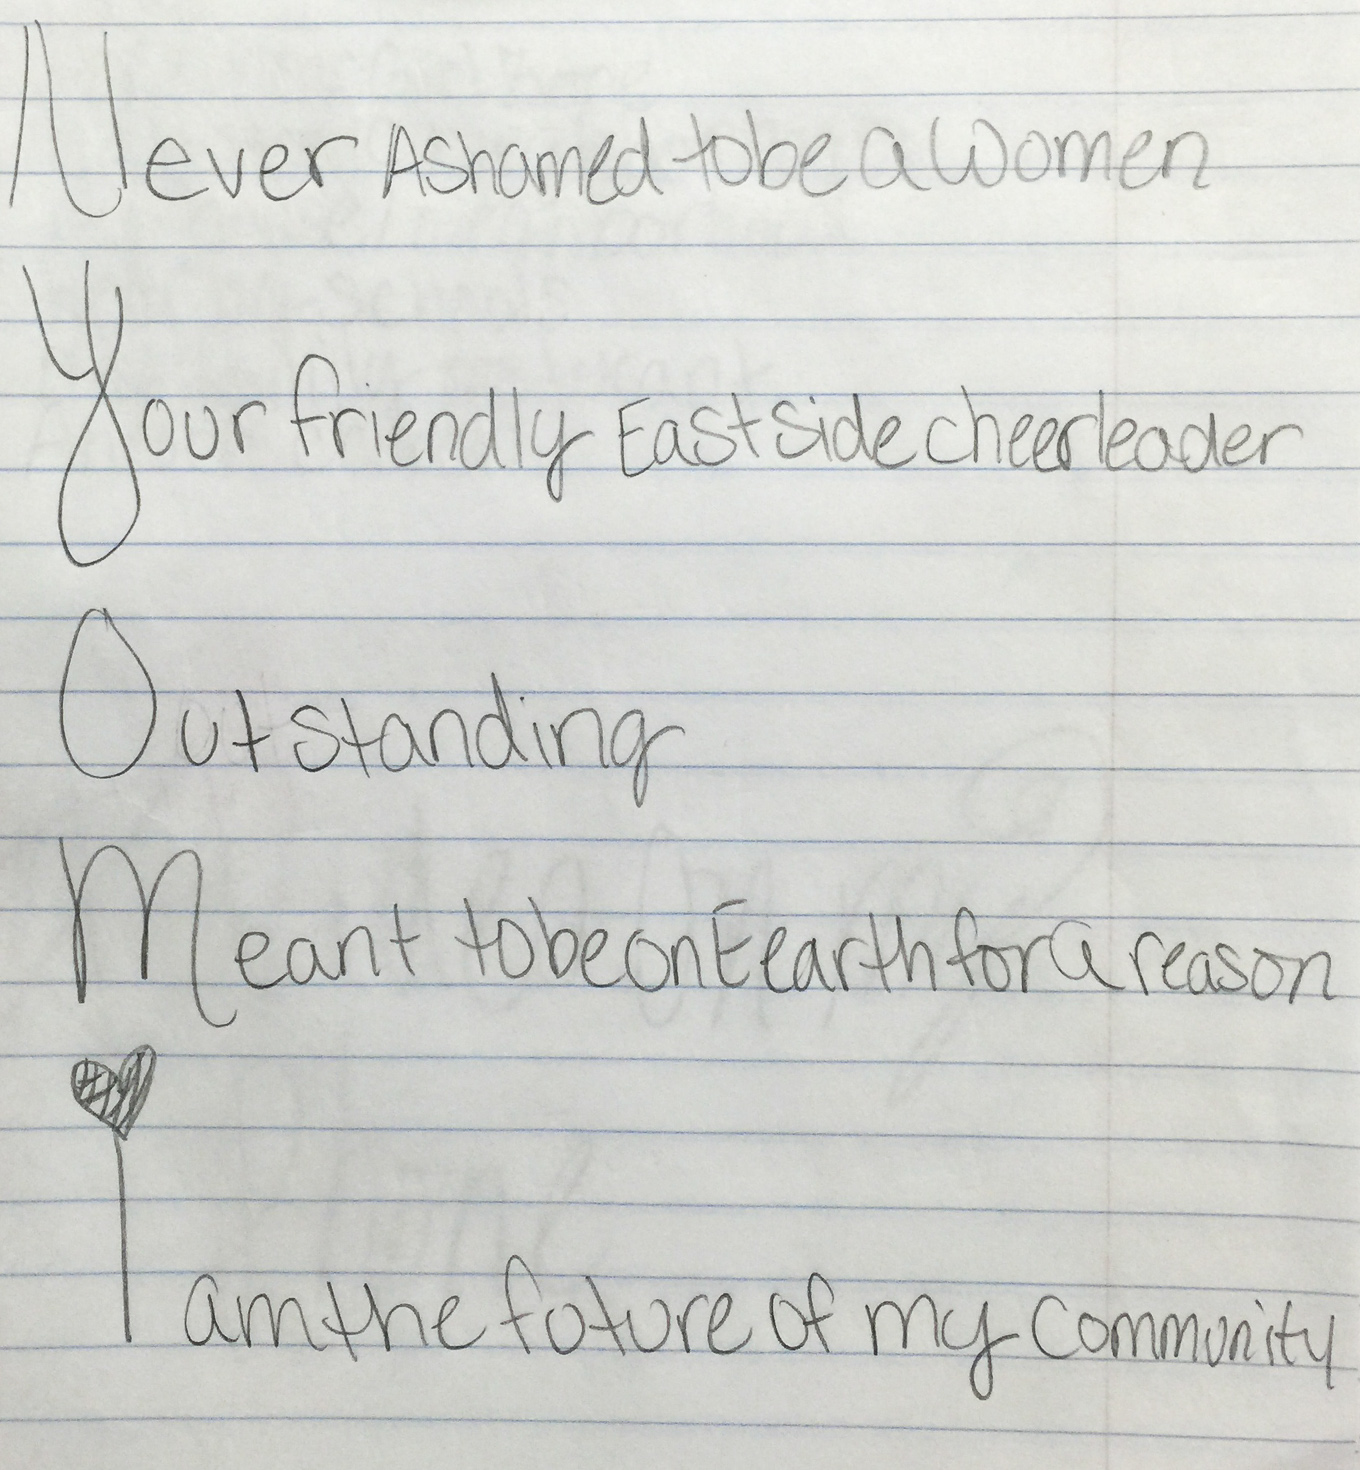 An acrostic poem written by Nyomi, 11. Photo courtesy of Ernesto Olivo.